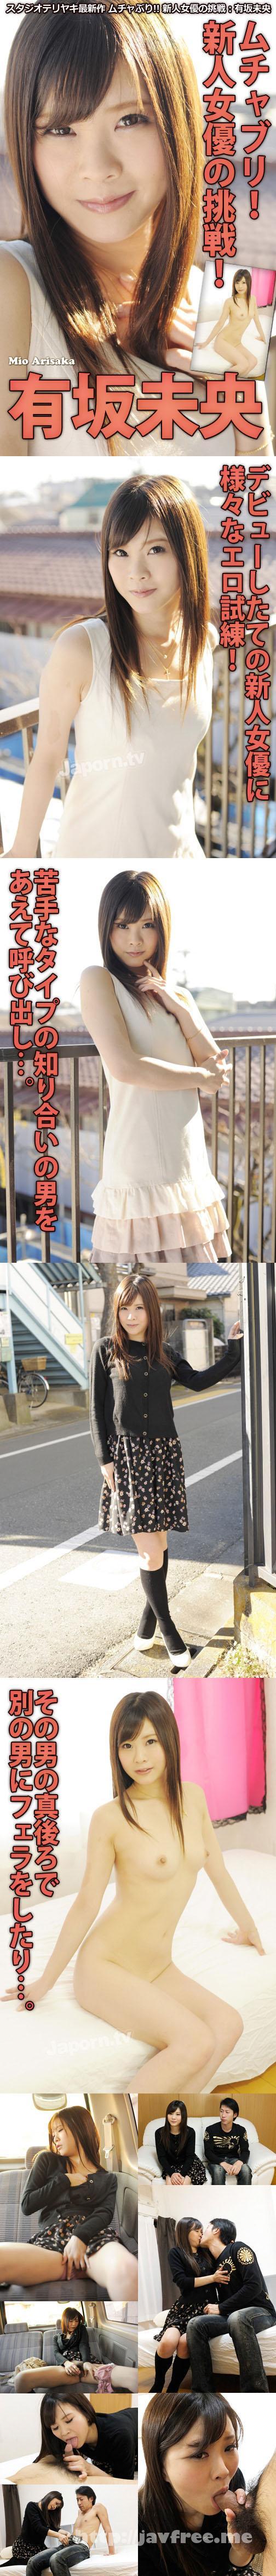 [BT 126] ムチャぶり!! 新人女優の挑戦 : 有坂未央 有坂未央 Mio Arisaka BT